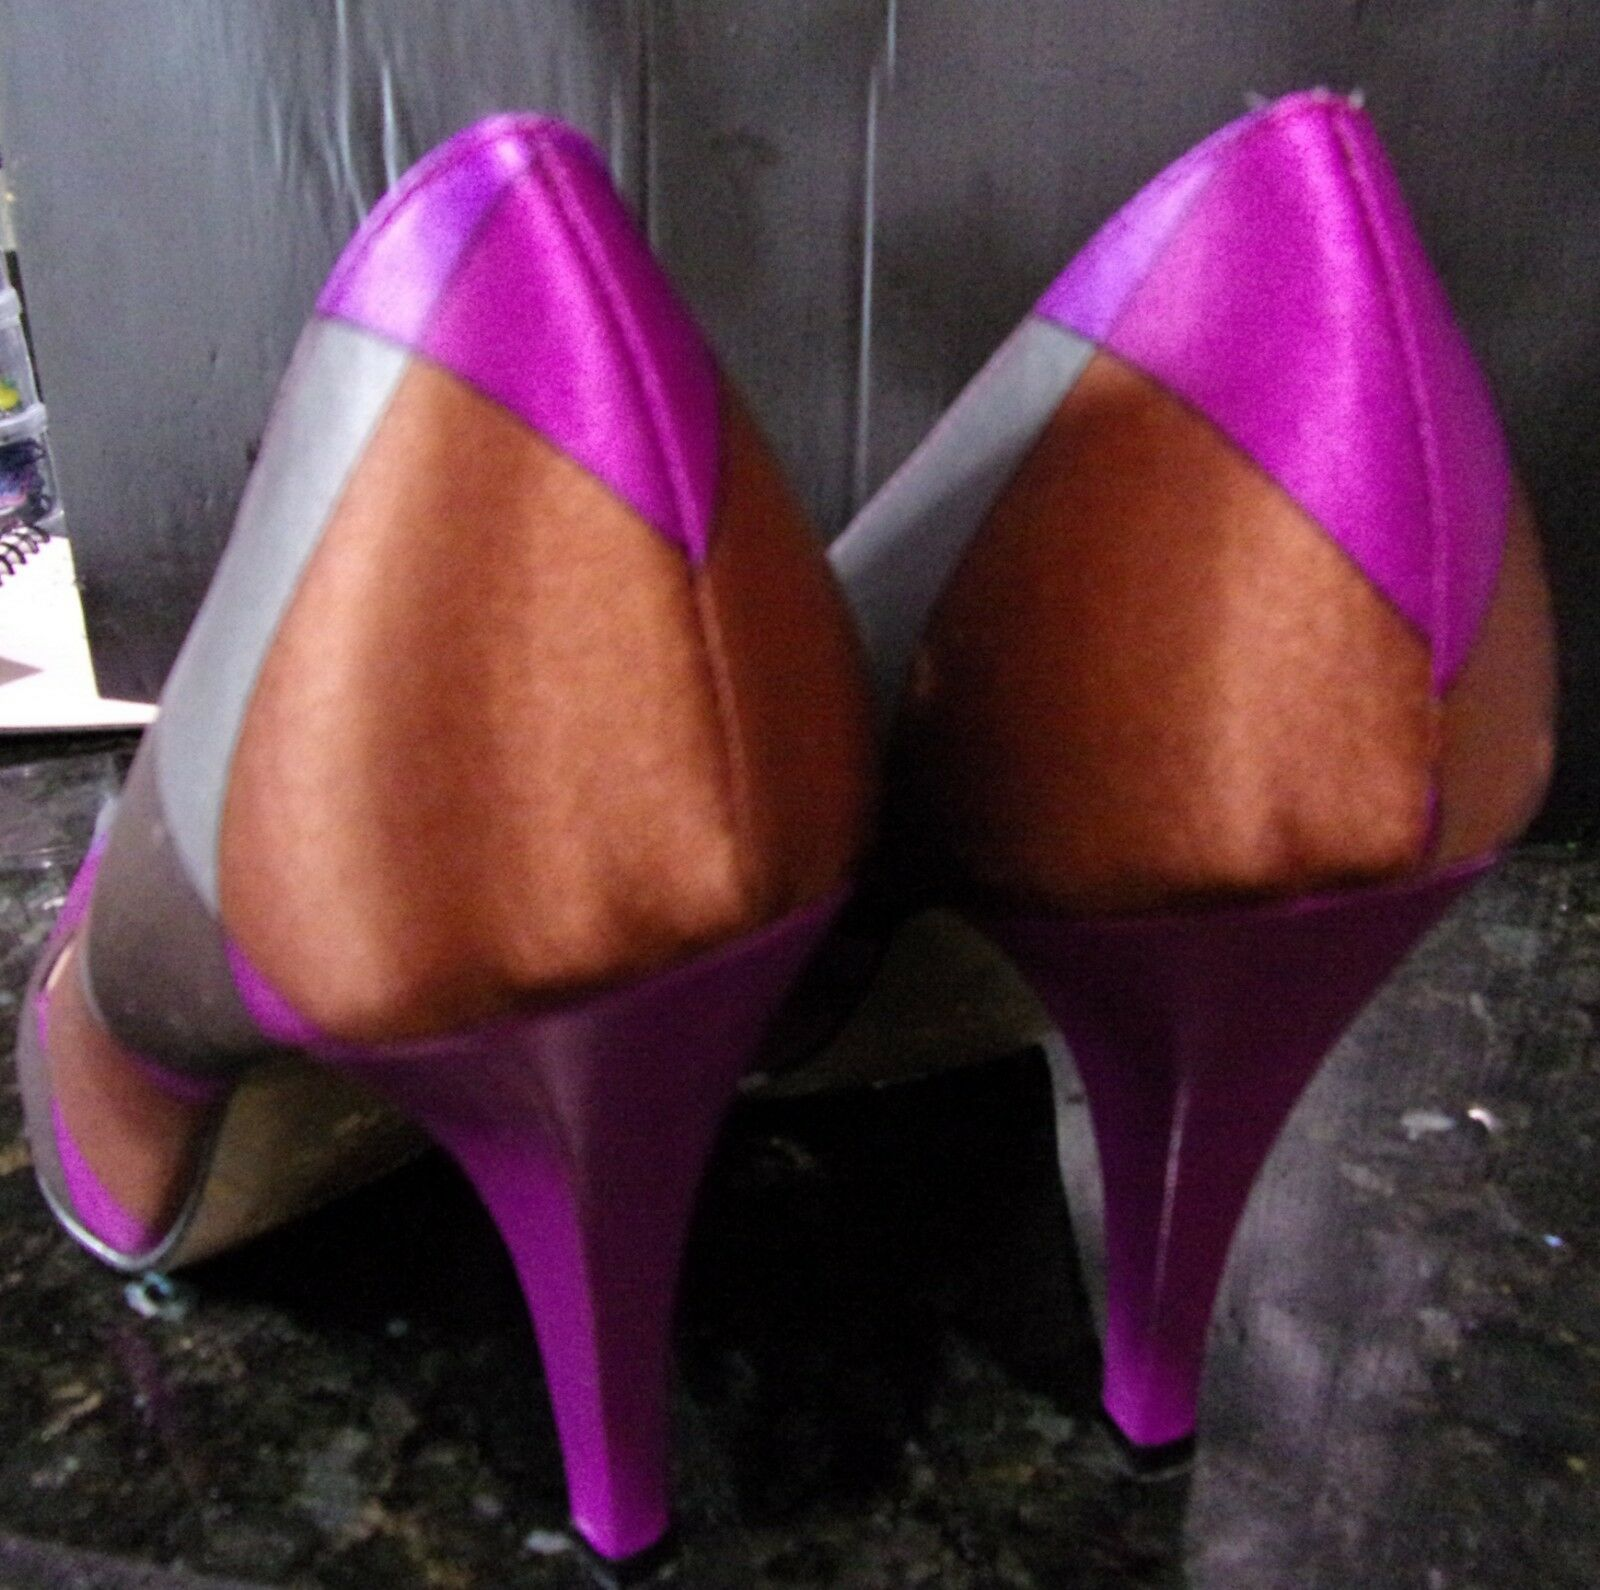 Emillio Pucci firma Satén púrpuraa MultiColor Stiletto Zapatos 37.5 Italia Italia Italia Lux 811d84